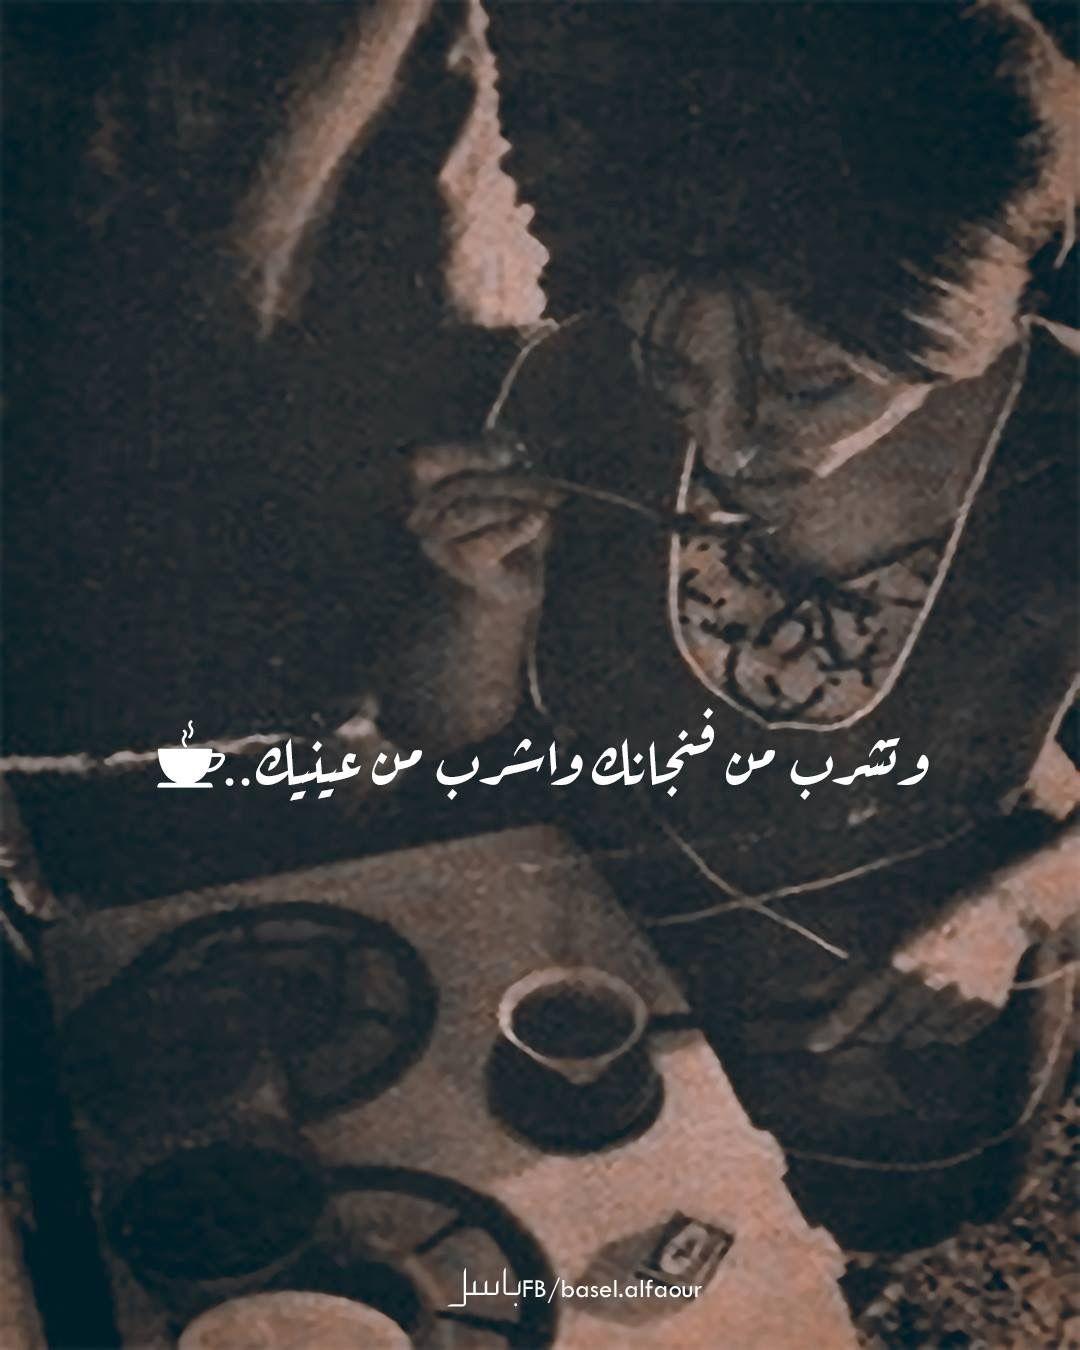 Pin By Semarsalih On فيروز Beautiful Arabic Words Arabic Love Quotes Arabic English Quotes